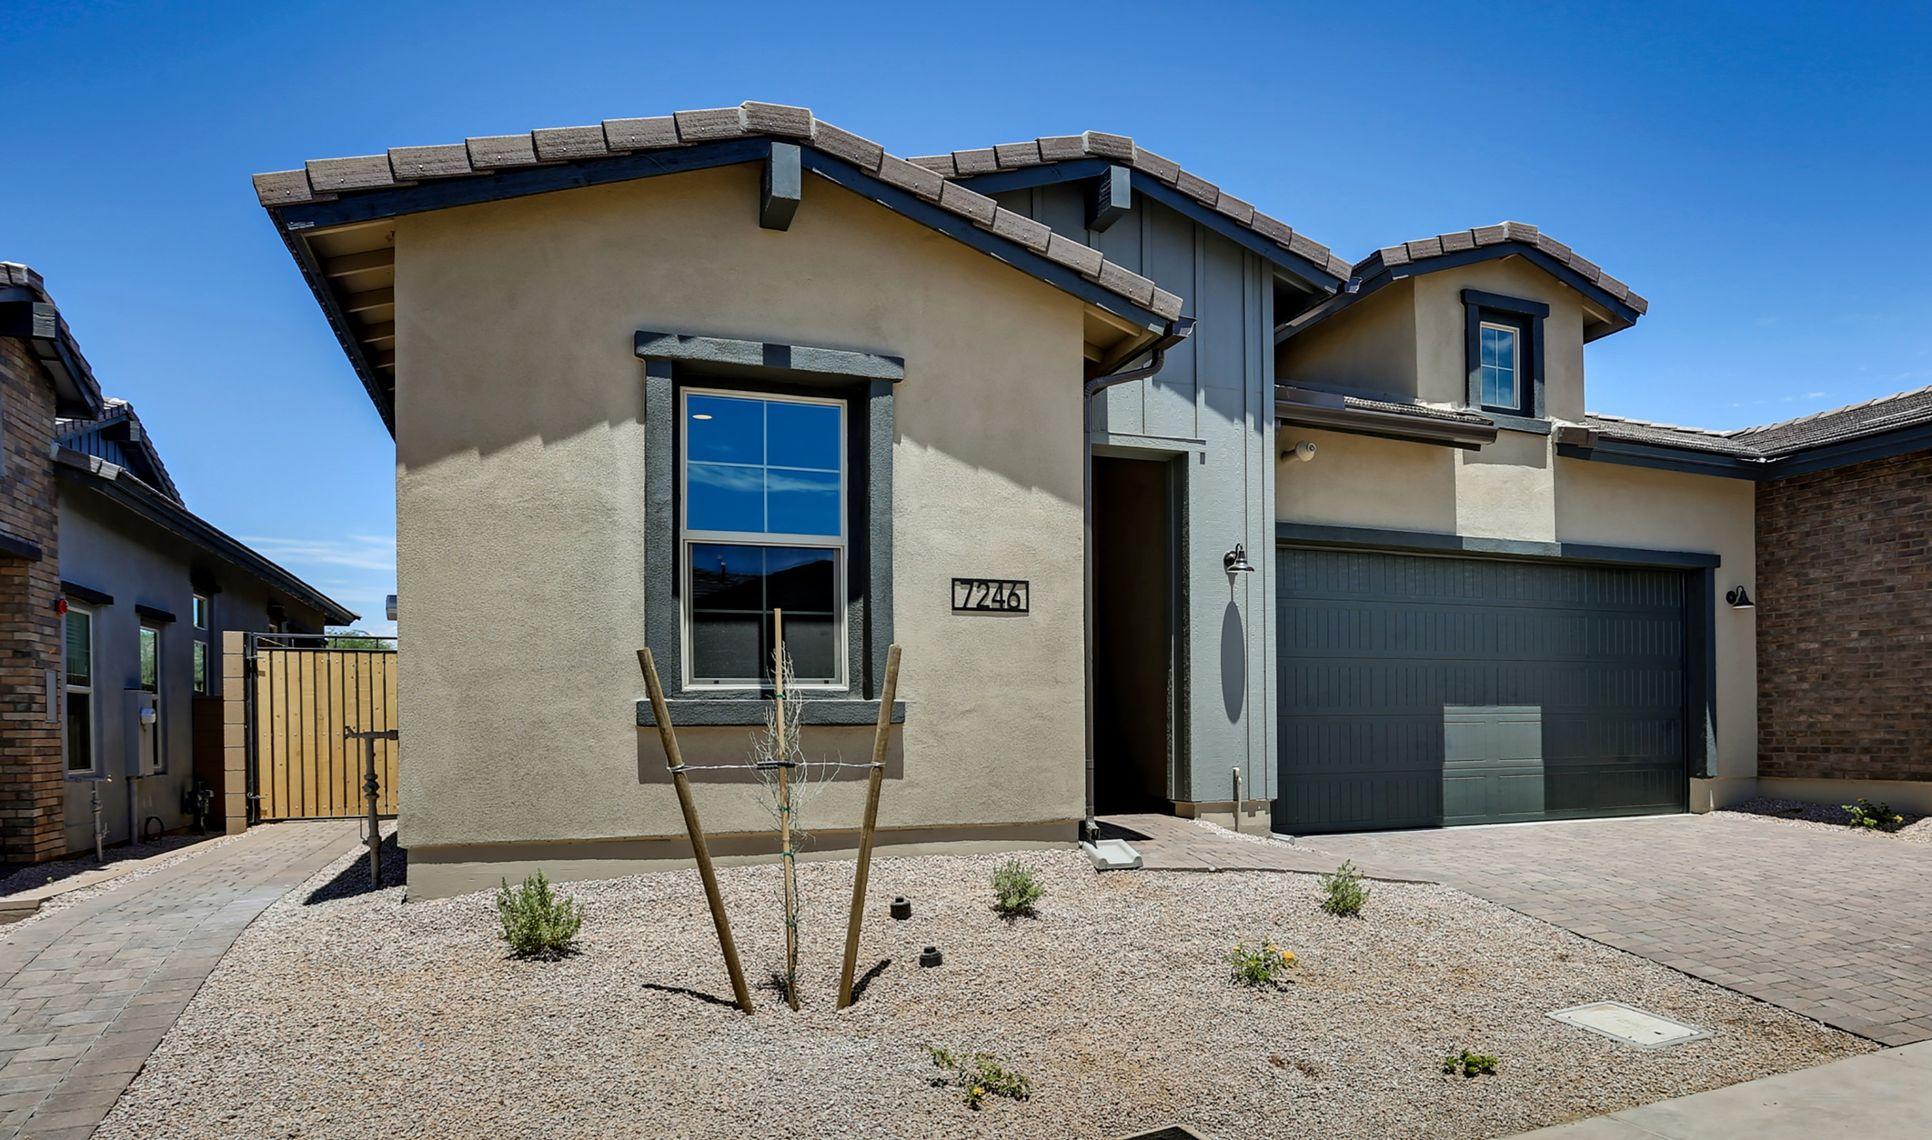 Exterior:Capstone Desert Modern Ranch with Apex